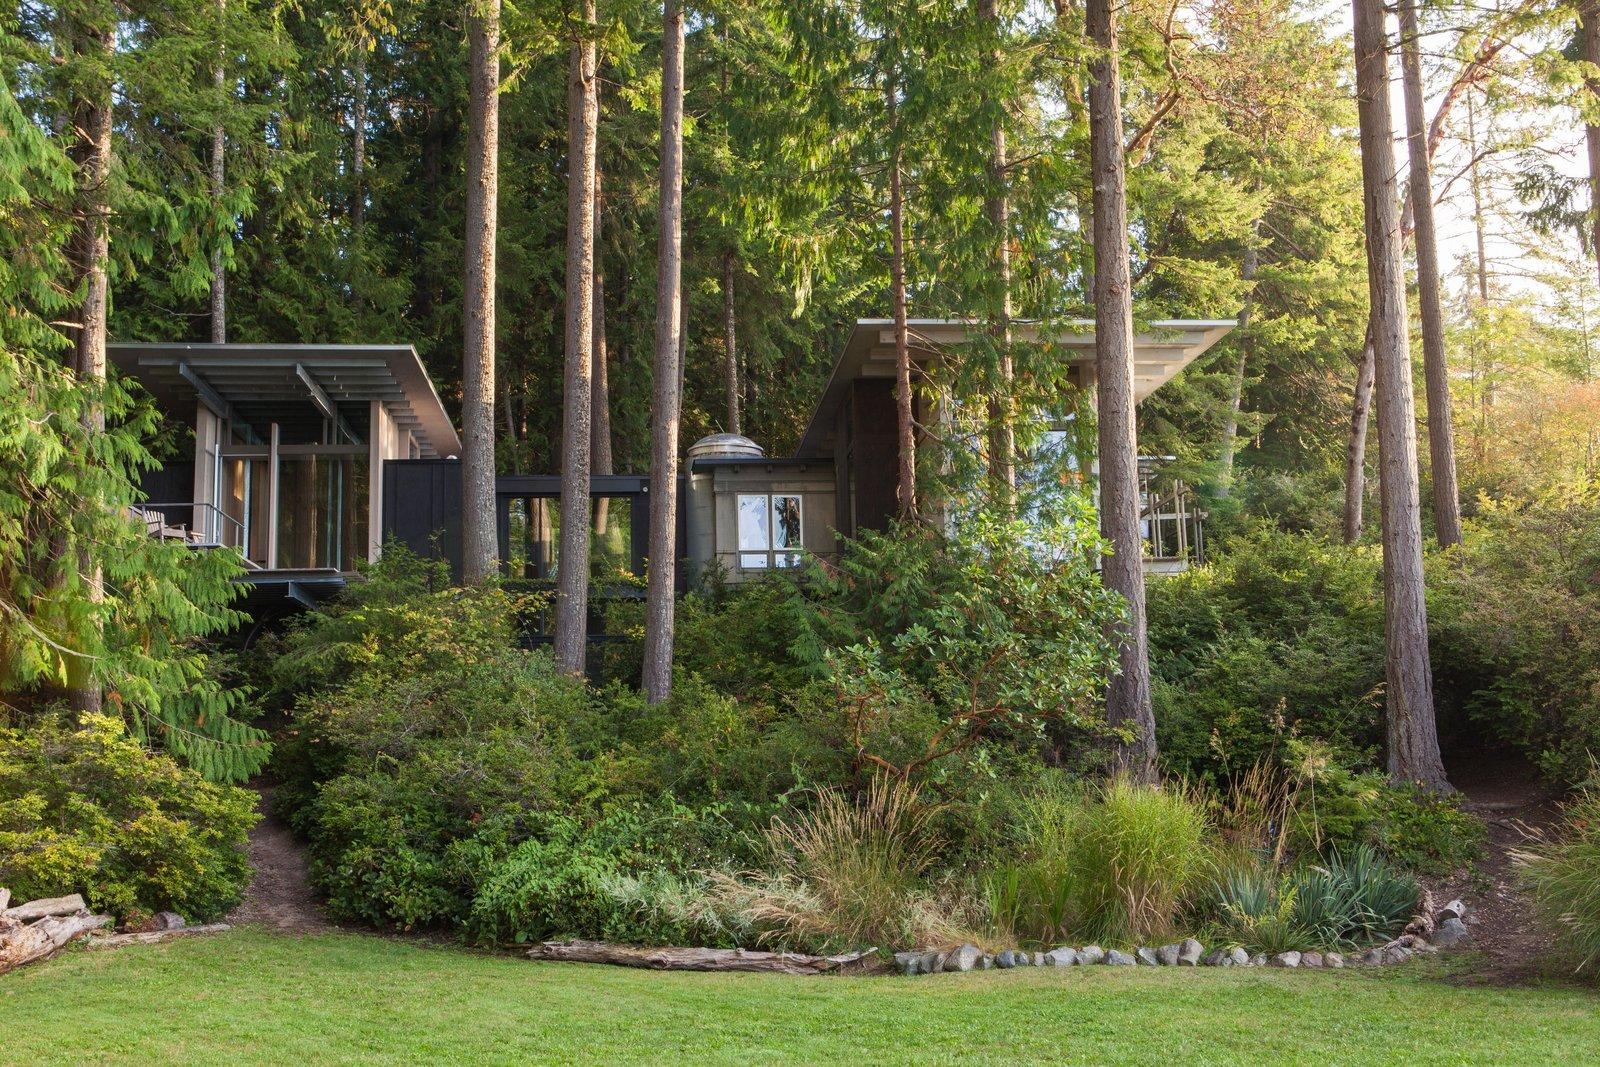 Cabin at Longbranch | Olson Kundig Tagged: Grass, Back Yard, Shrubs, Trees, Exterior, and House.  Cabin in Longbranch by Olson Kundig